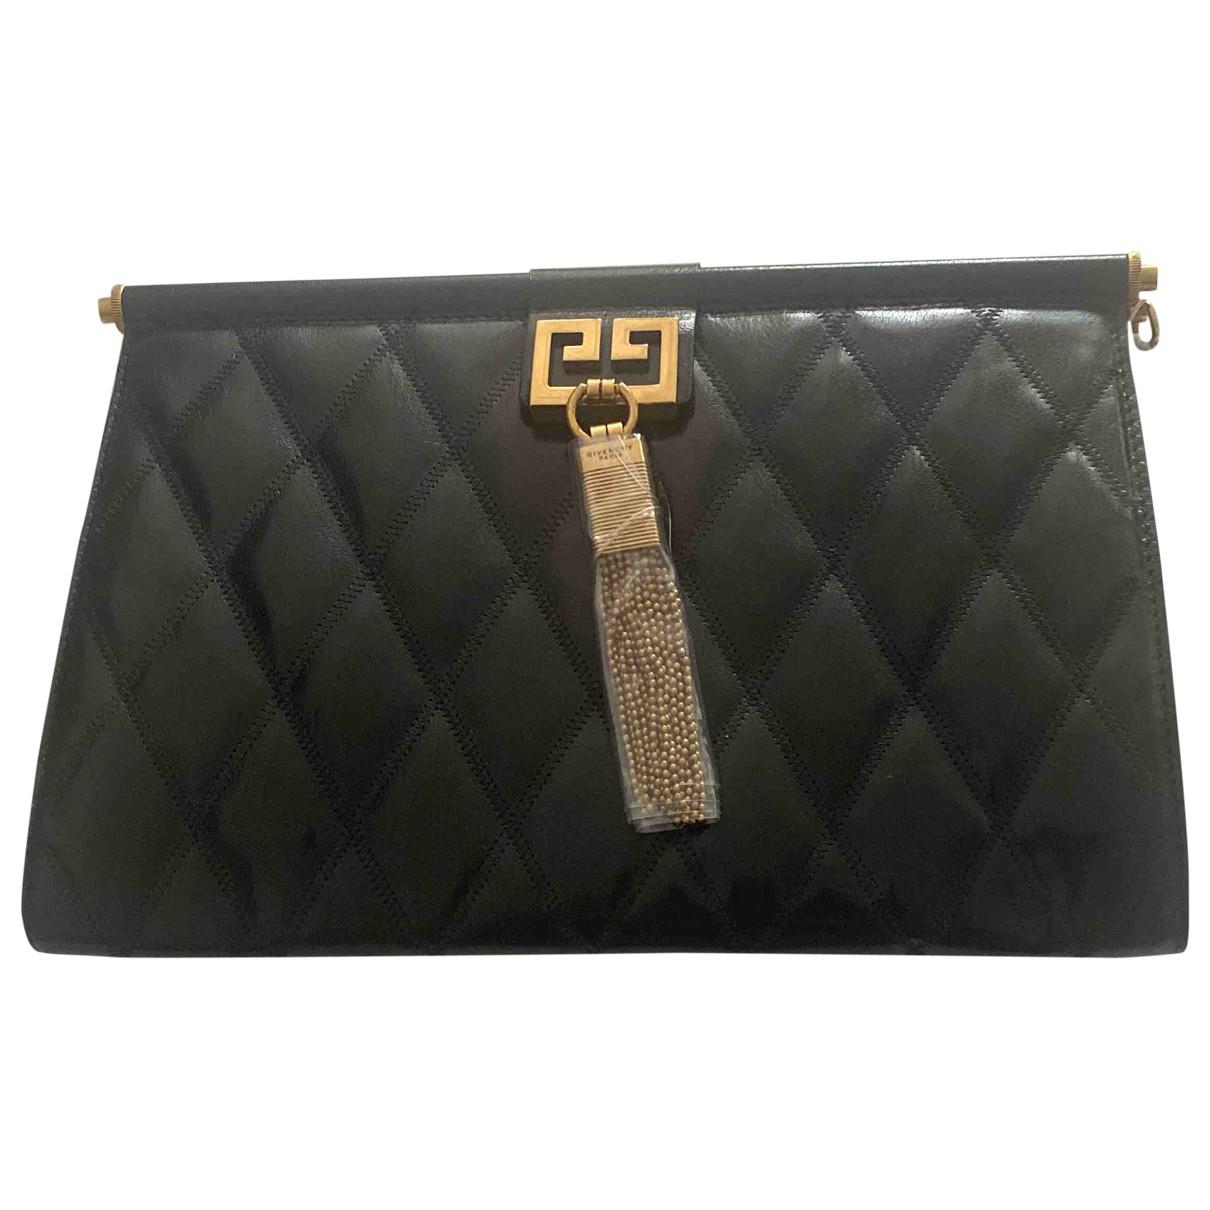 Givenchy Gem  Handtasche in  Schwarz Leder